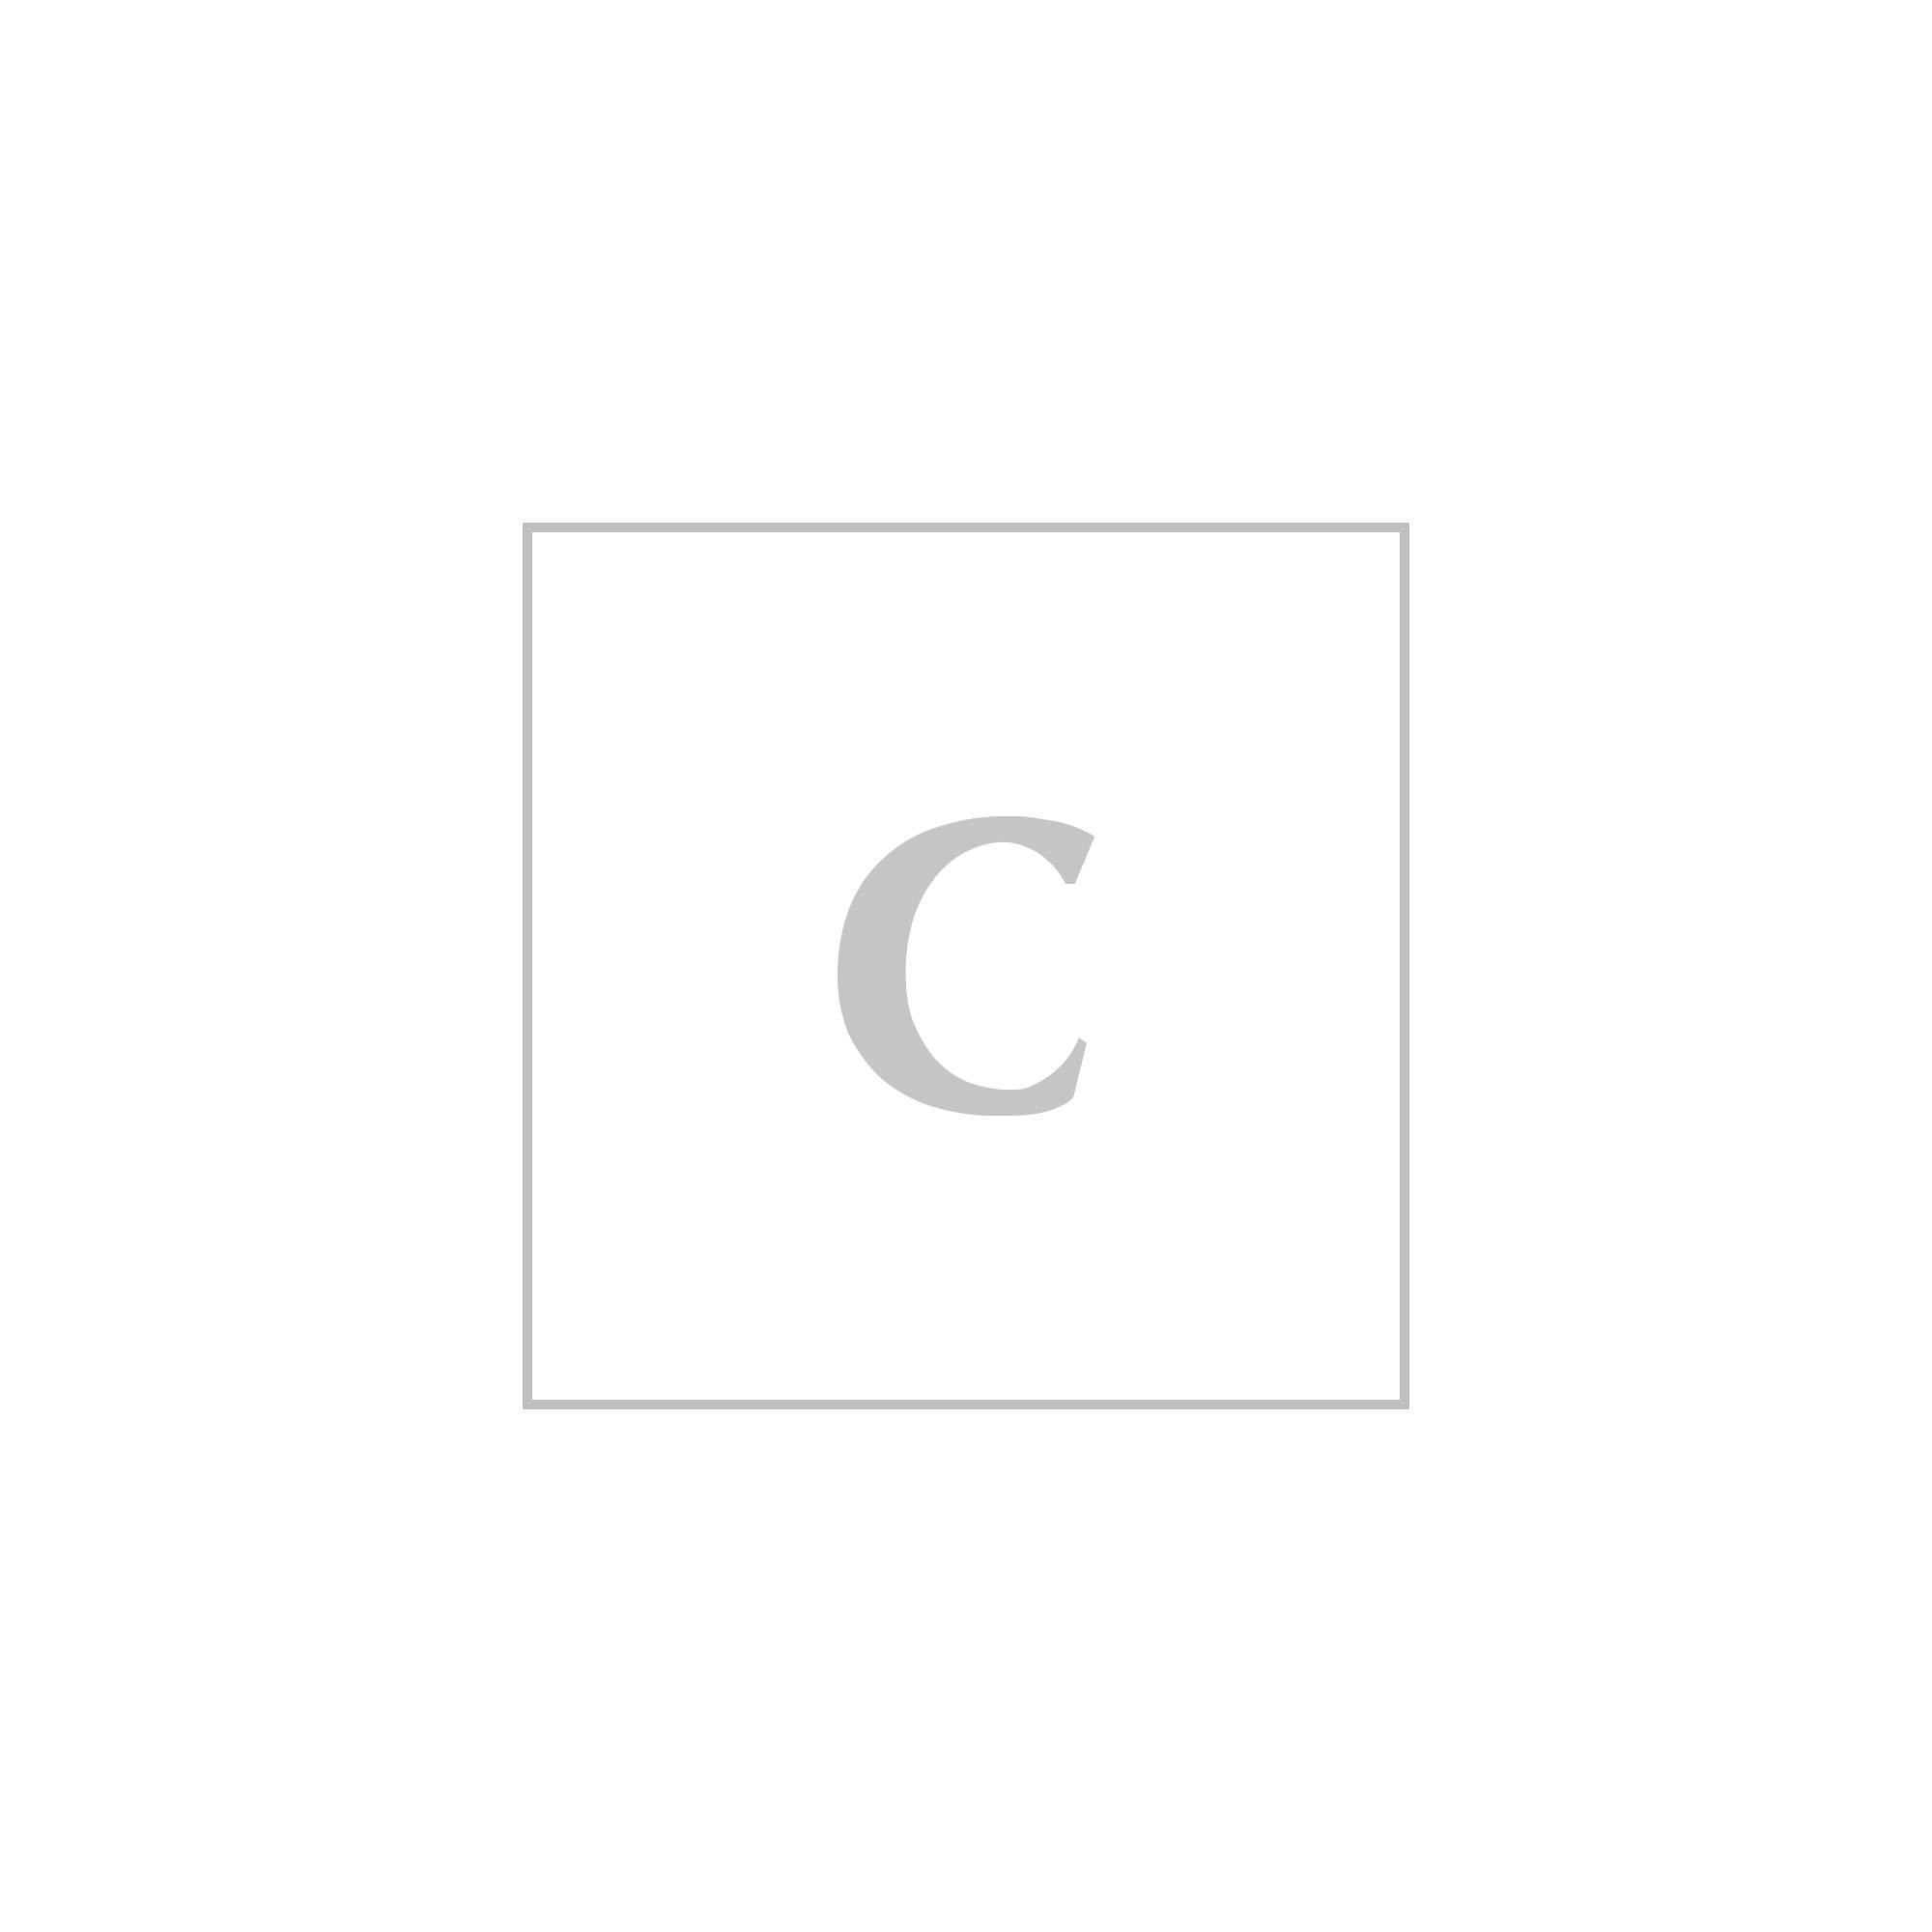 Saint laurent mini pochette monogram envelope